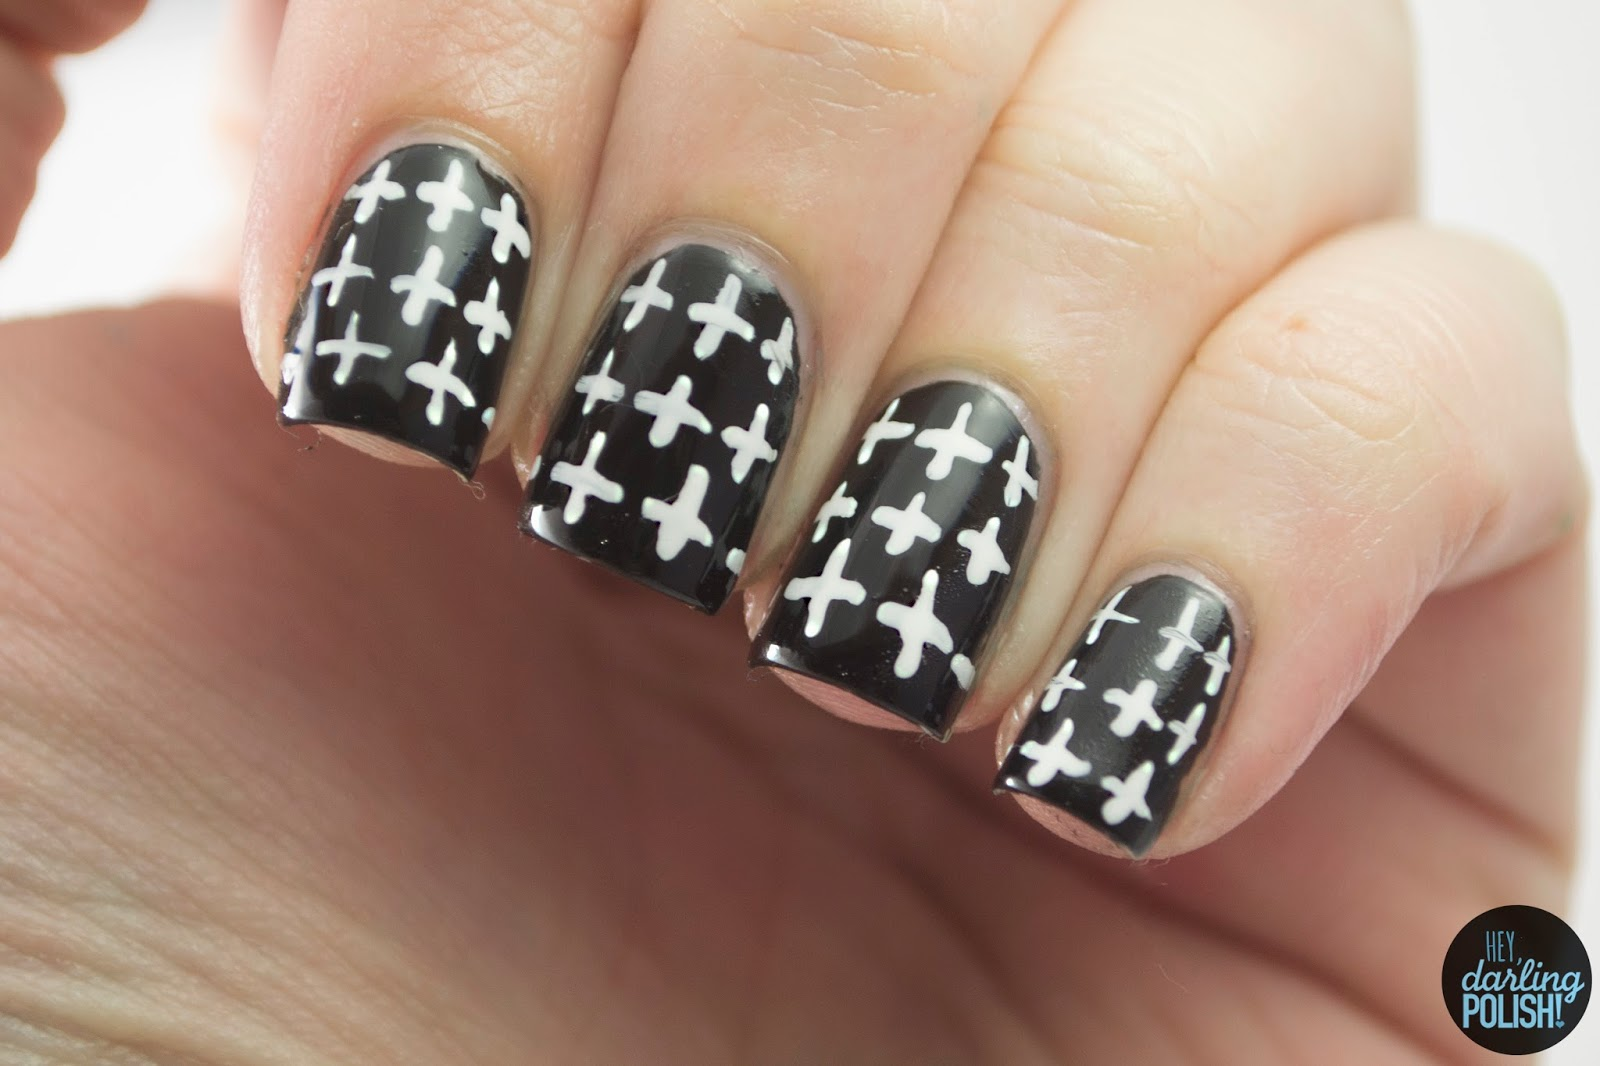 nails, nail art, nail polish, polish, black, white, plus, pattern, patterned wednesdays, hey darling polish